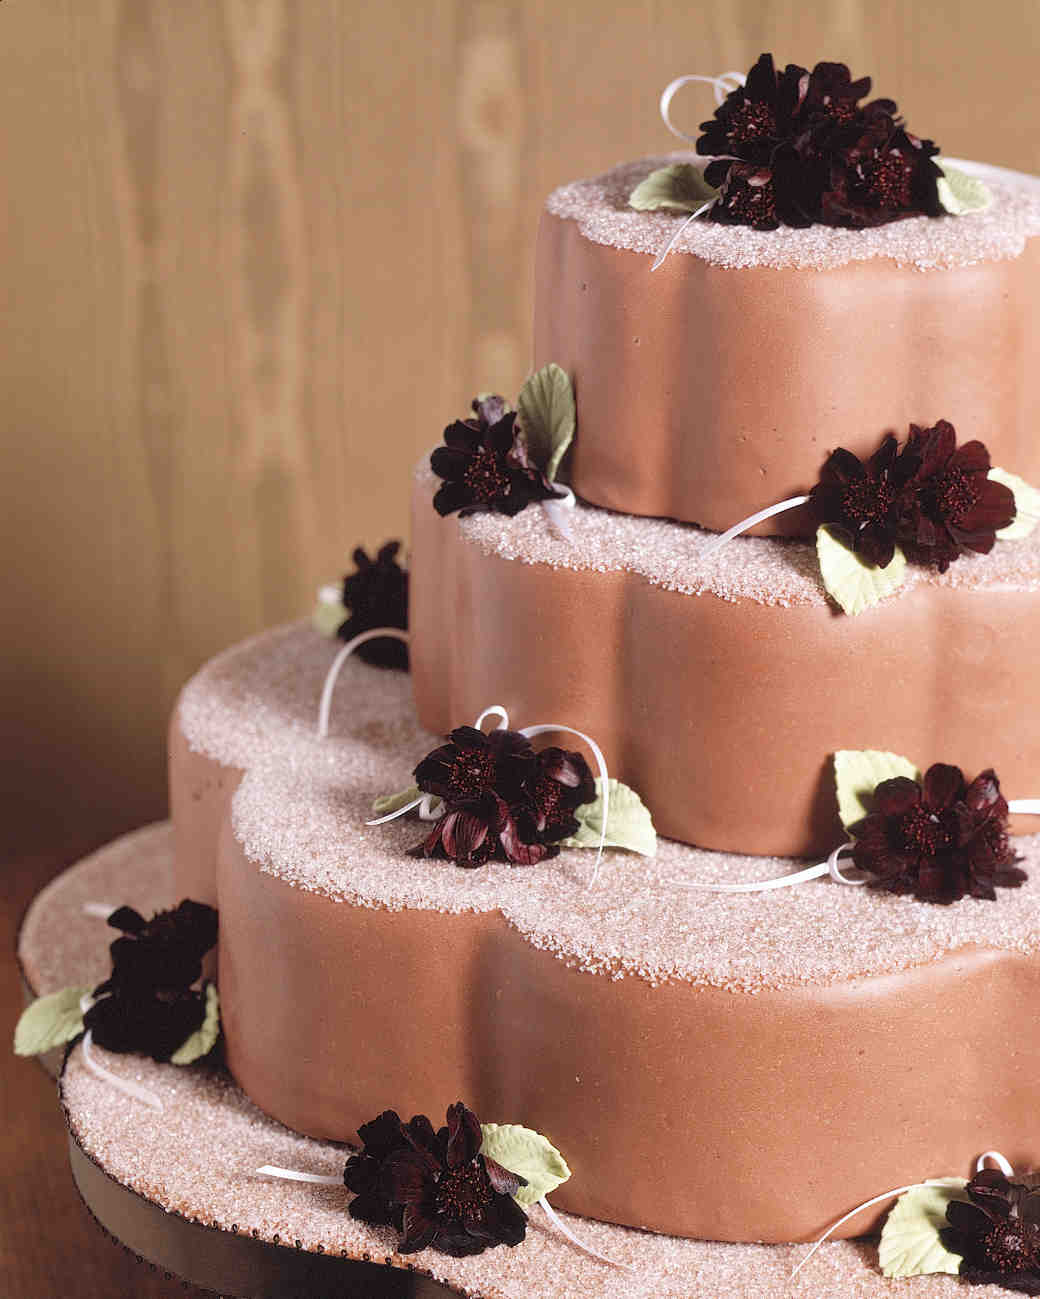 chocolate-cake-ideas-a99873_cosmosc2-1114.jpg